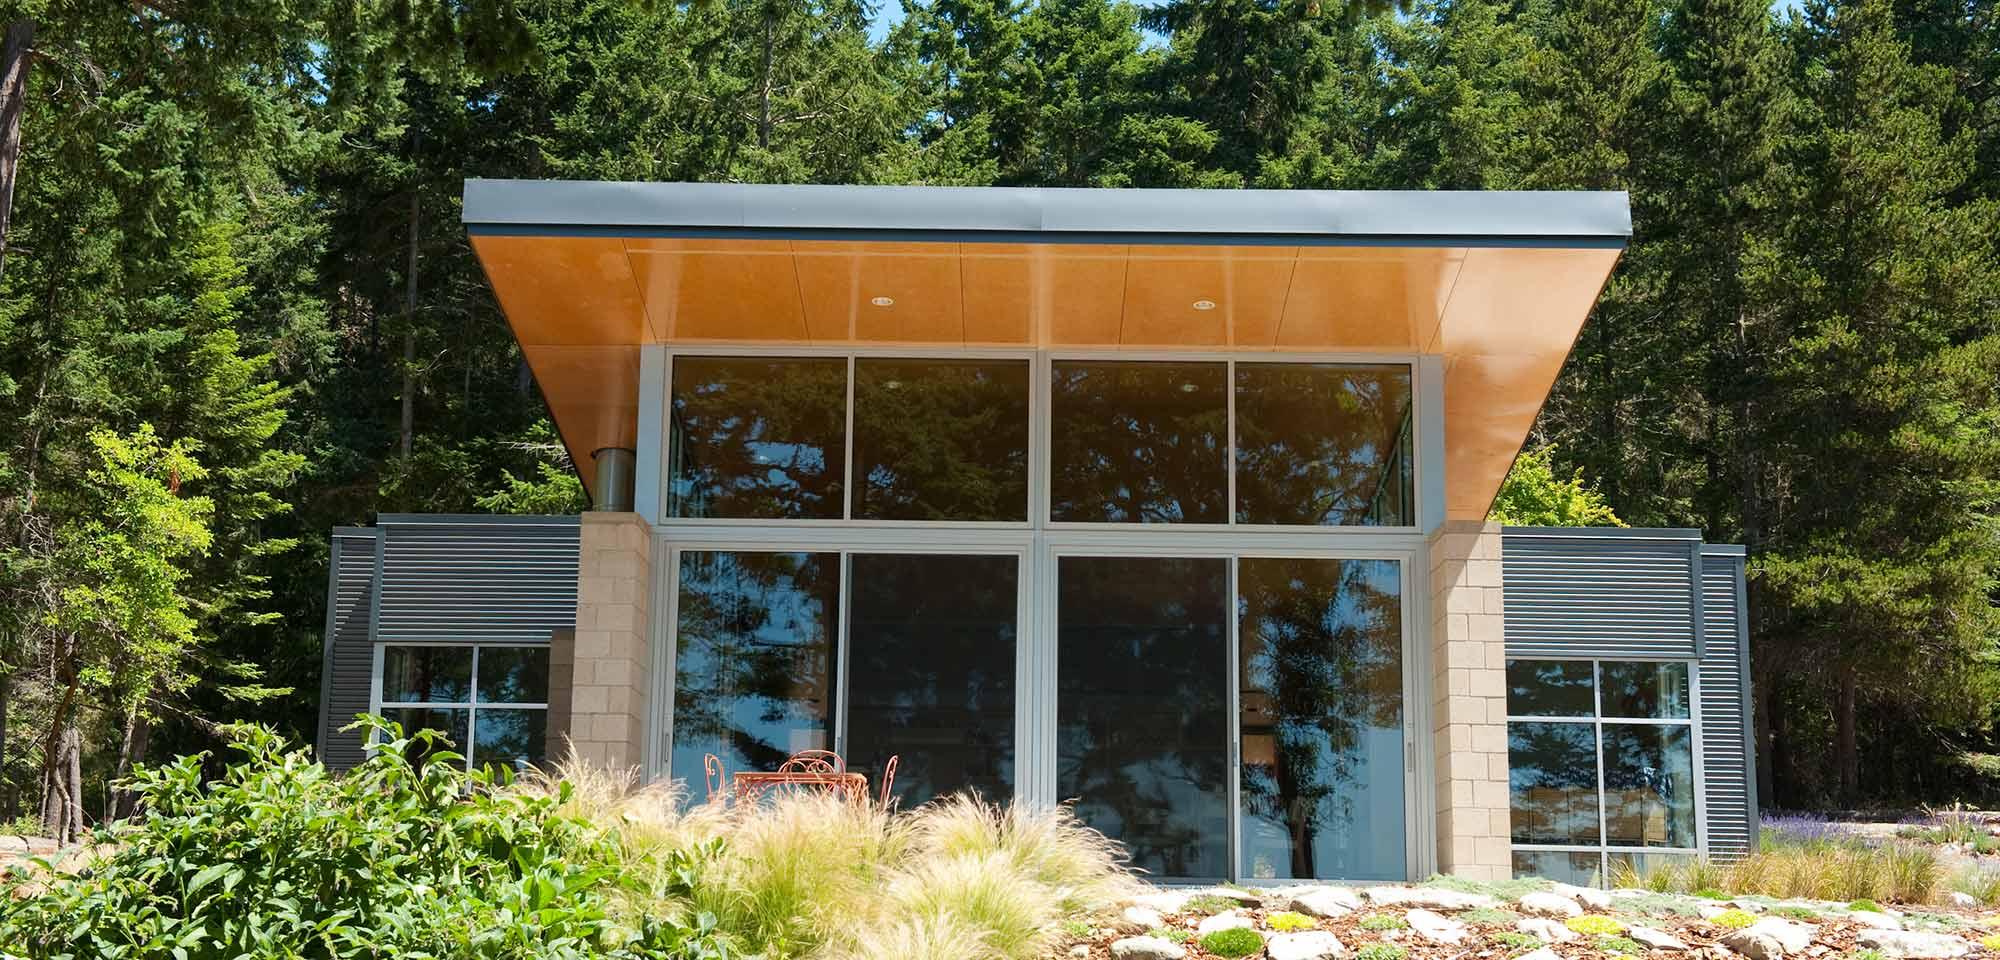 Lopez Island Cabin designed by Stuart Silk